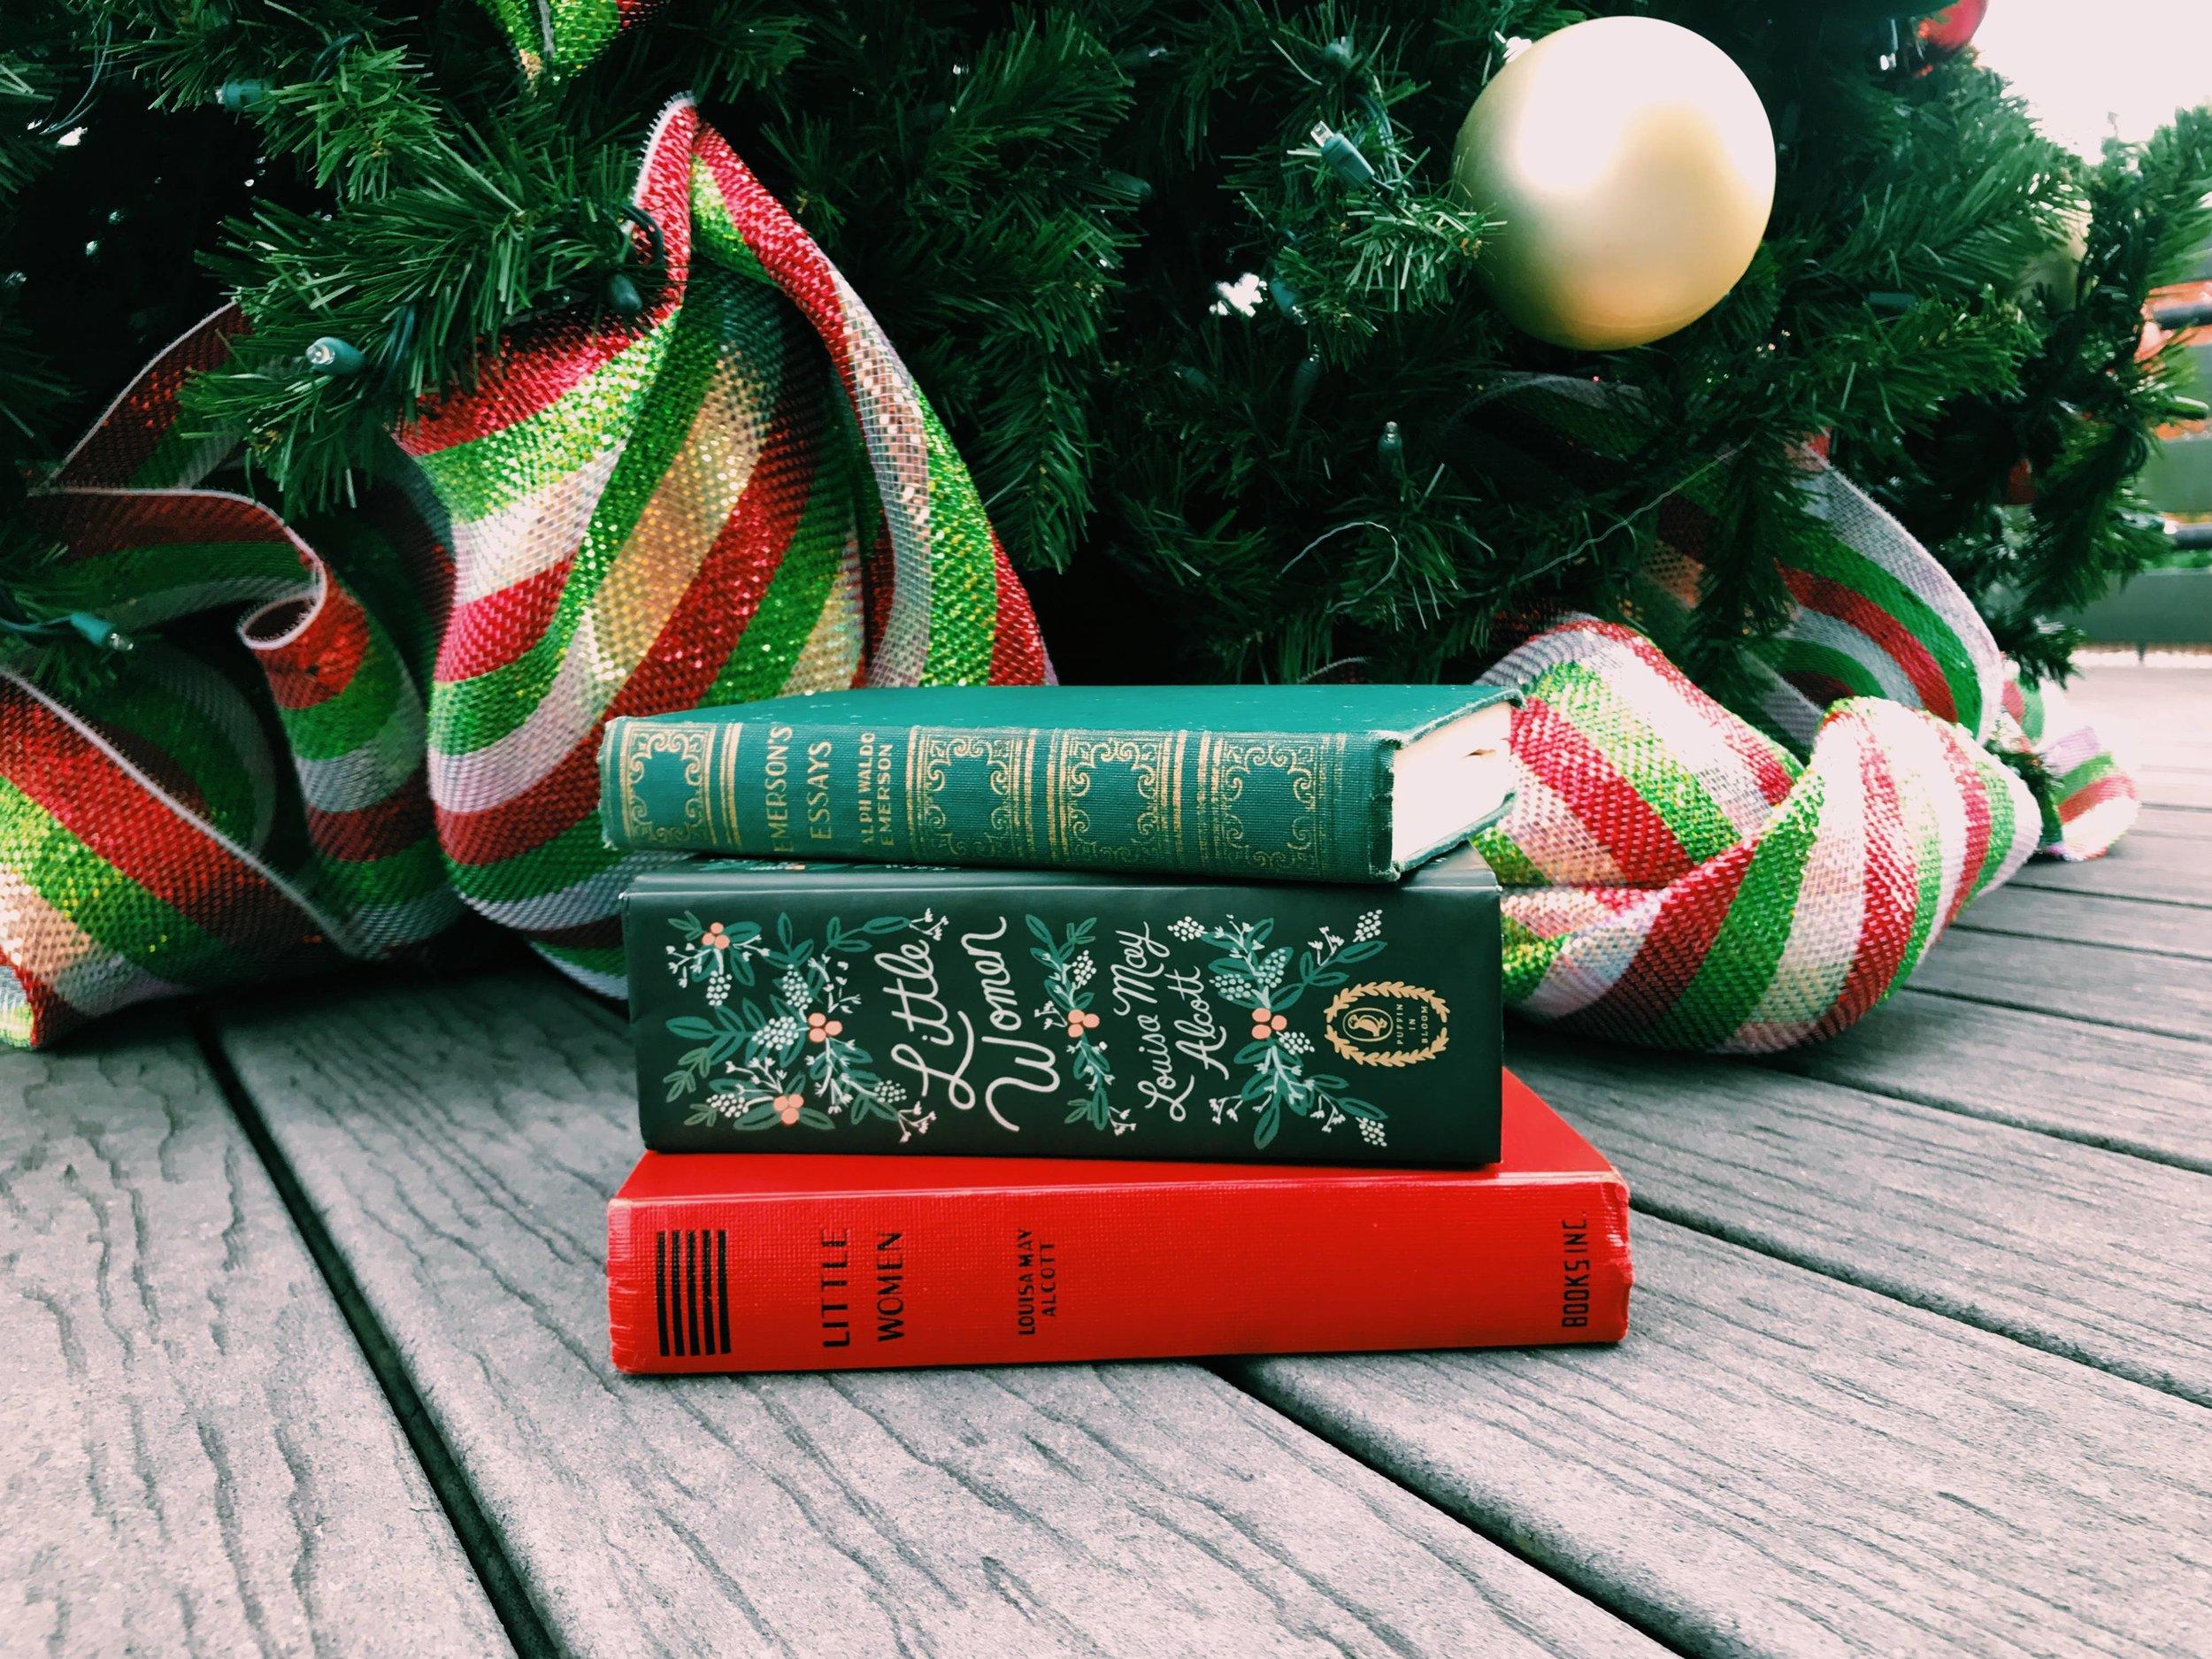 Three Heel Clicks - Cheerful Holiday Posts for Everyone (14).jpg